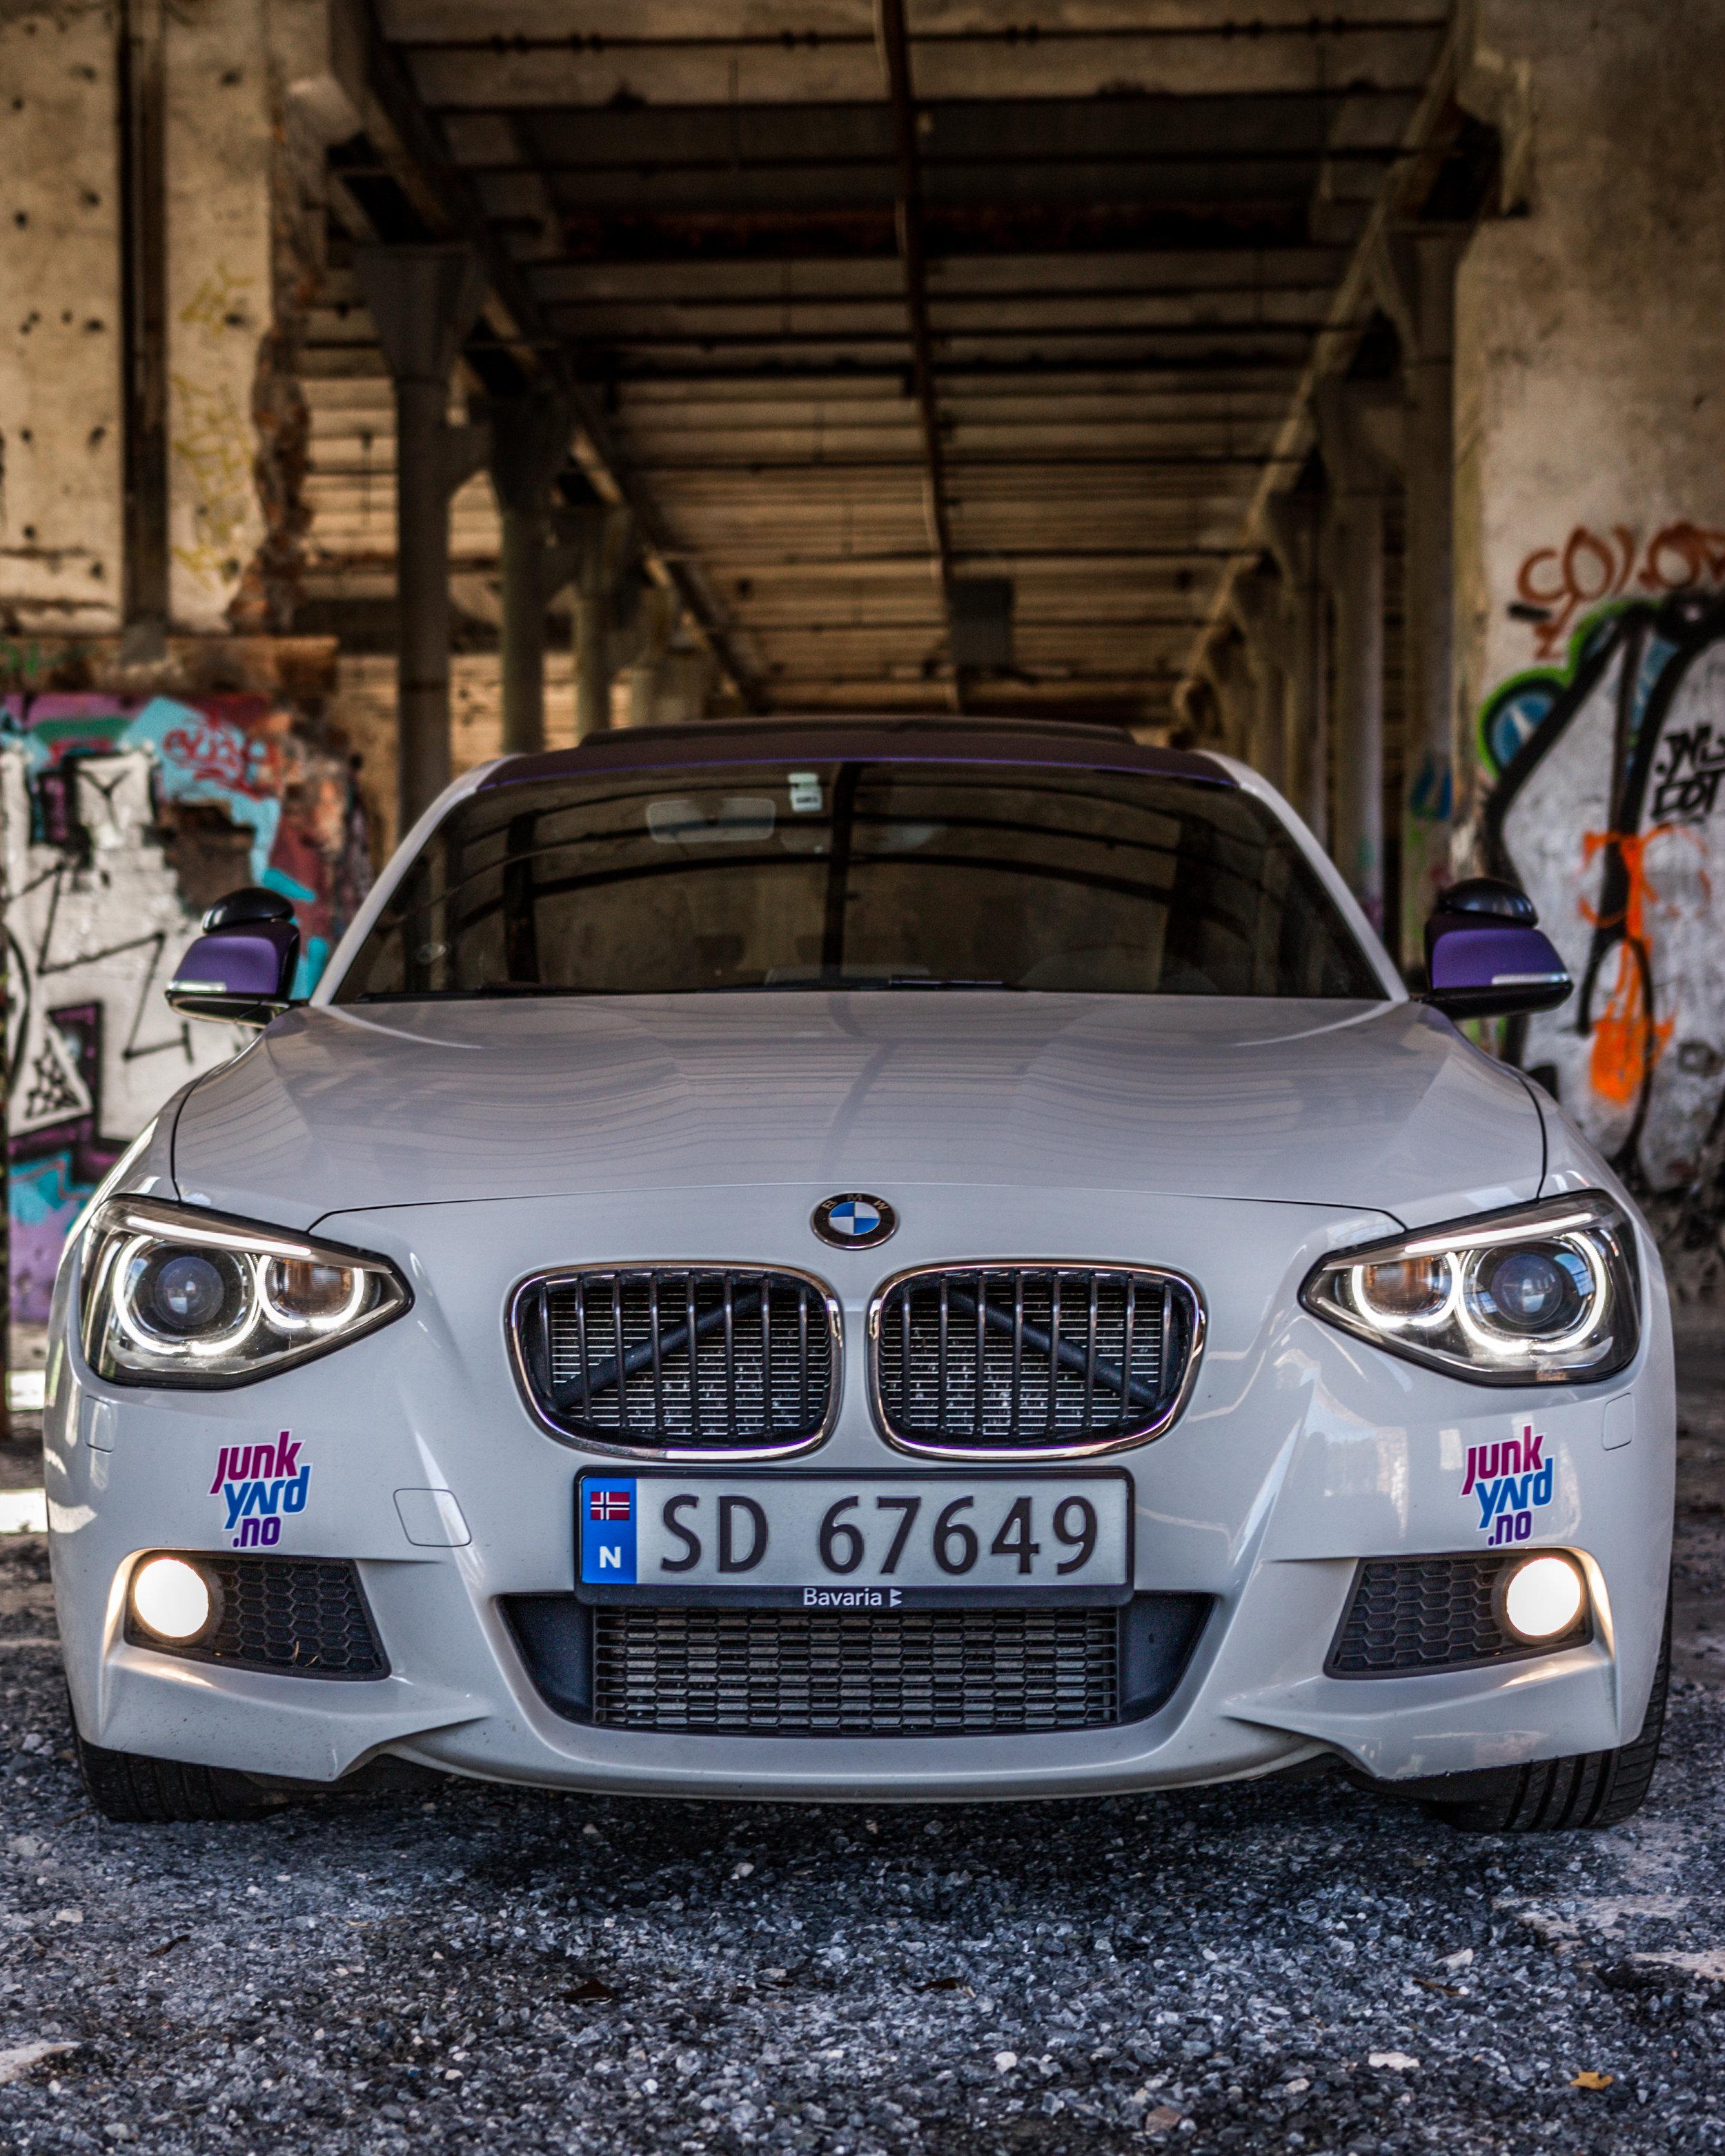 BMW, Trafikkskolen, Trafikalt grunnkurs